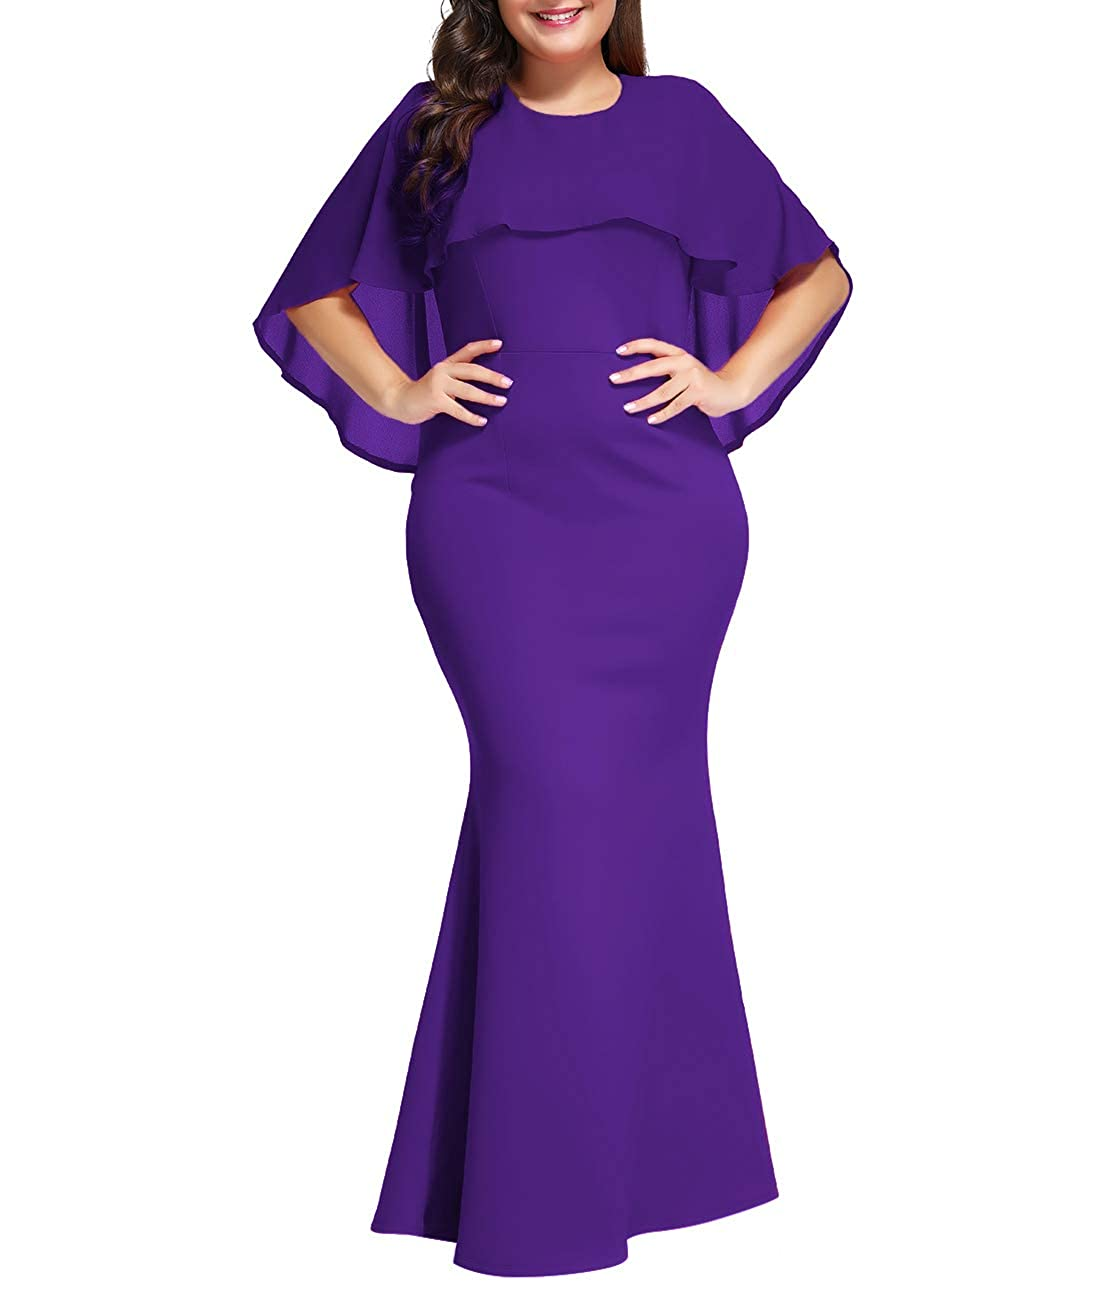 Lalagen Womens Ruffle Mermaid Formal Gown Plus Size Evening Party Maxi  Dress Purple XXL